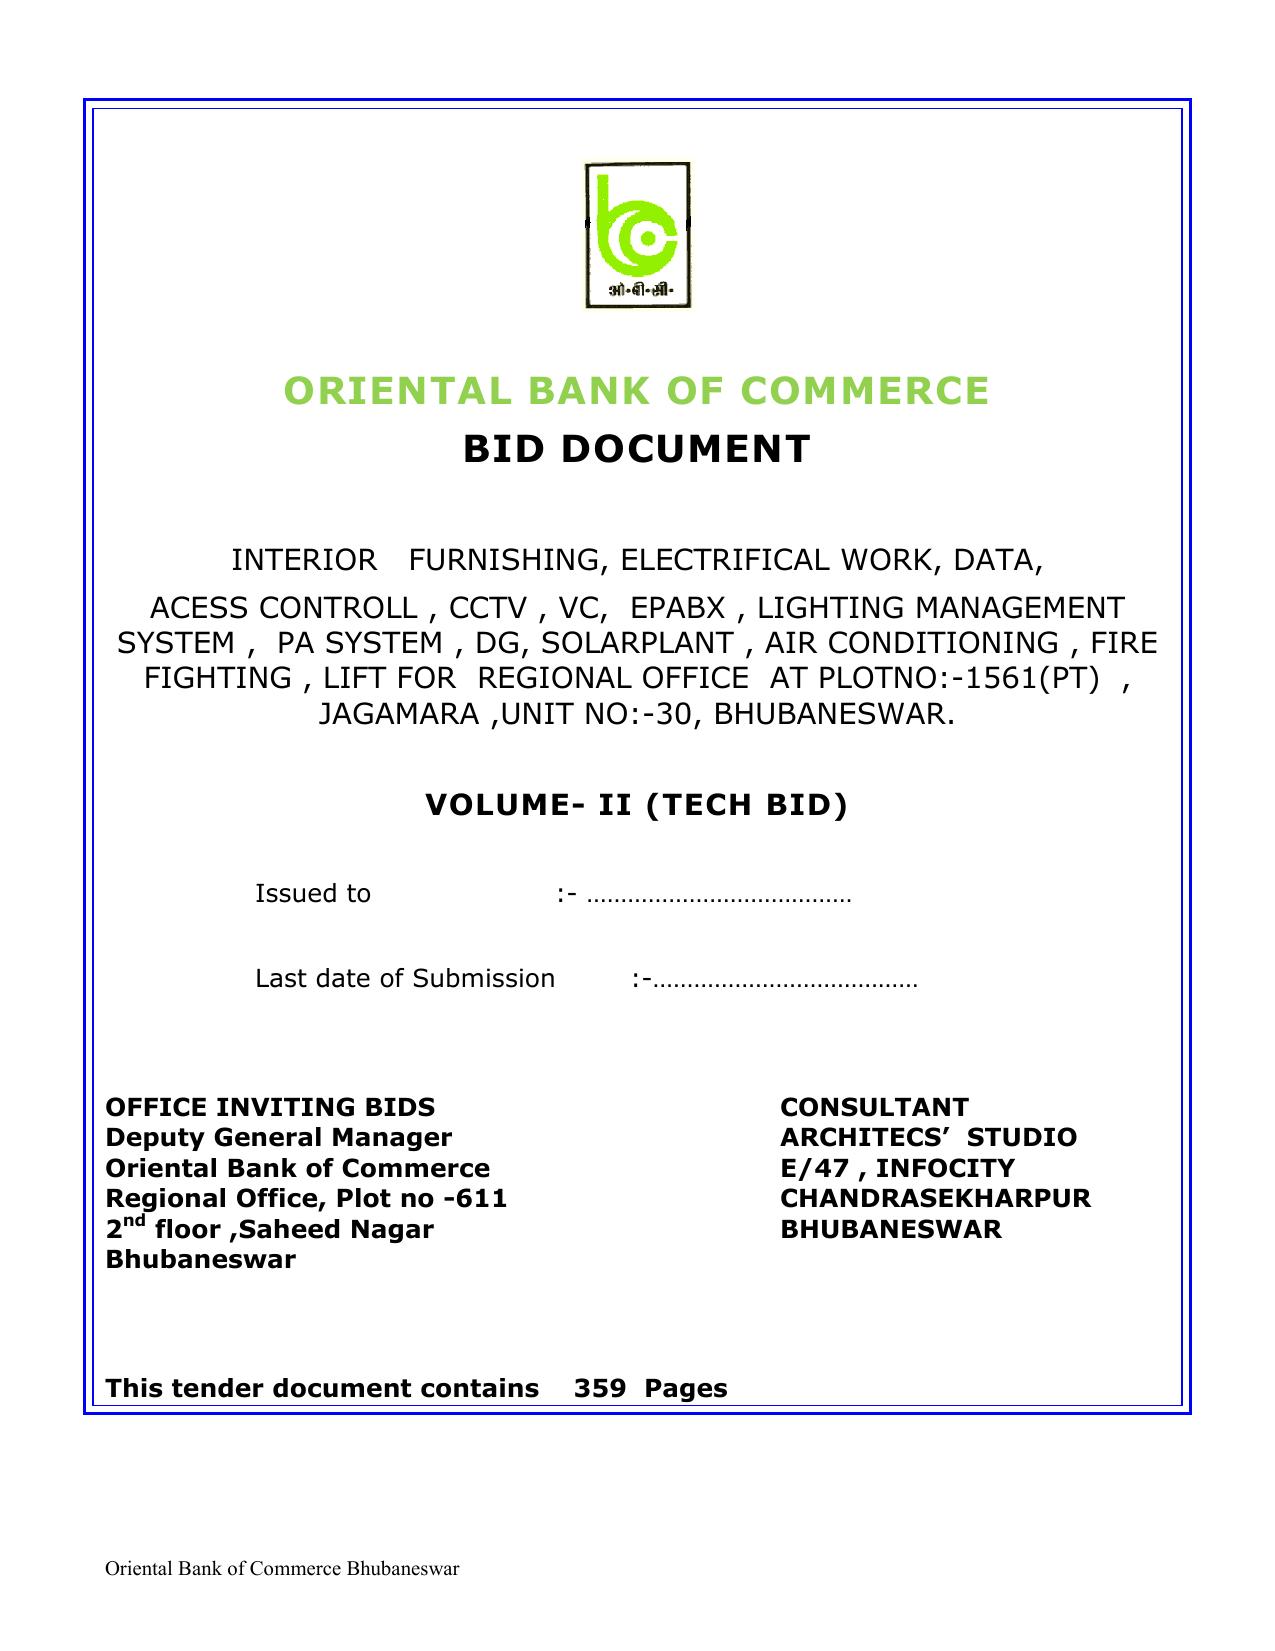 Modest Dc12v 200mm 8inch Green Walk Man Led Pedestrian Traffic Light Module Dynamic Green Led Traffic Lamp To Produce An Effect Toward Clear Vision Traffic Light